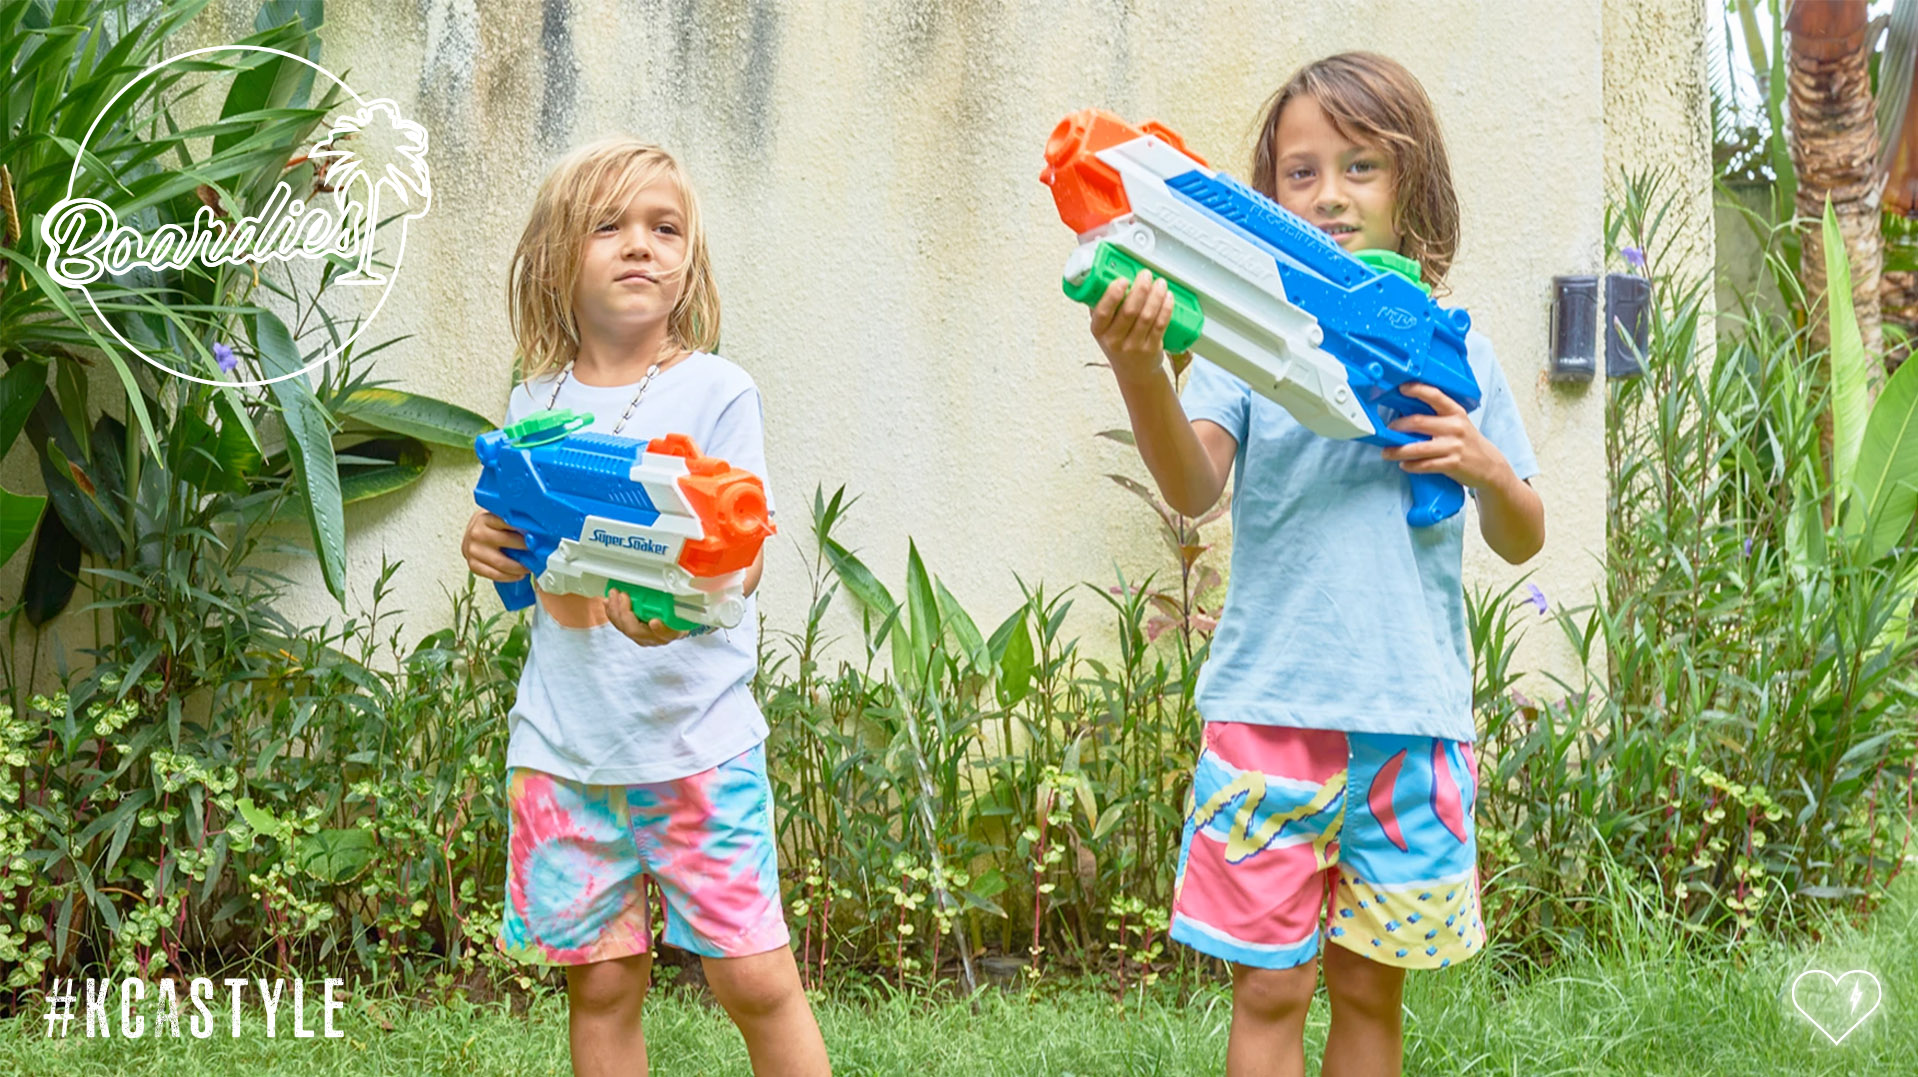 SHOP BOARDIES SWIM - KIDS CURATED APPAREL